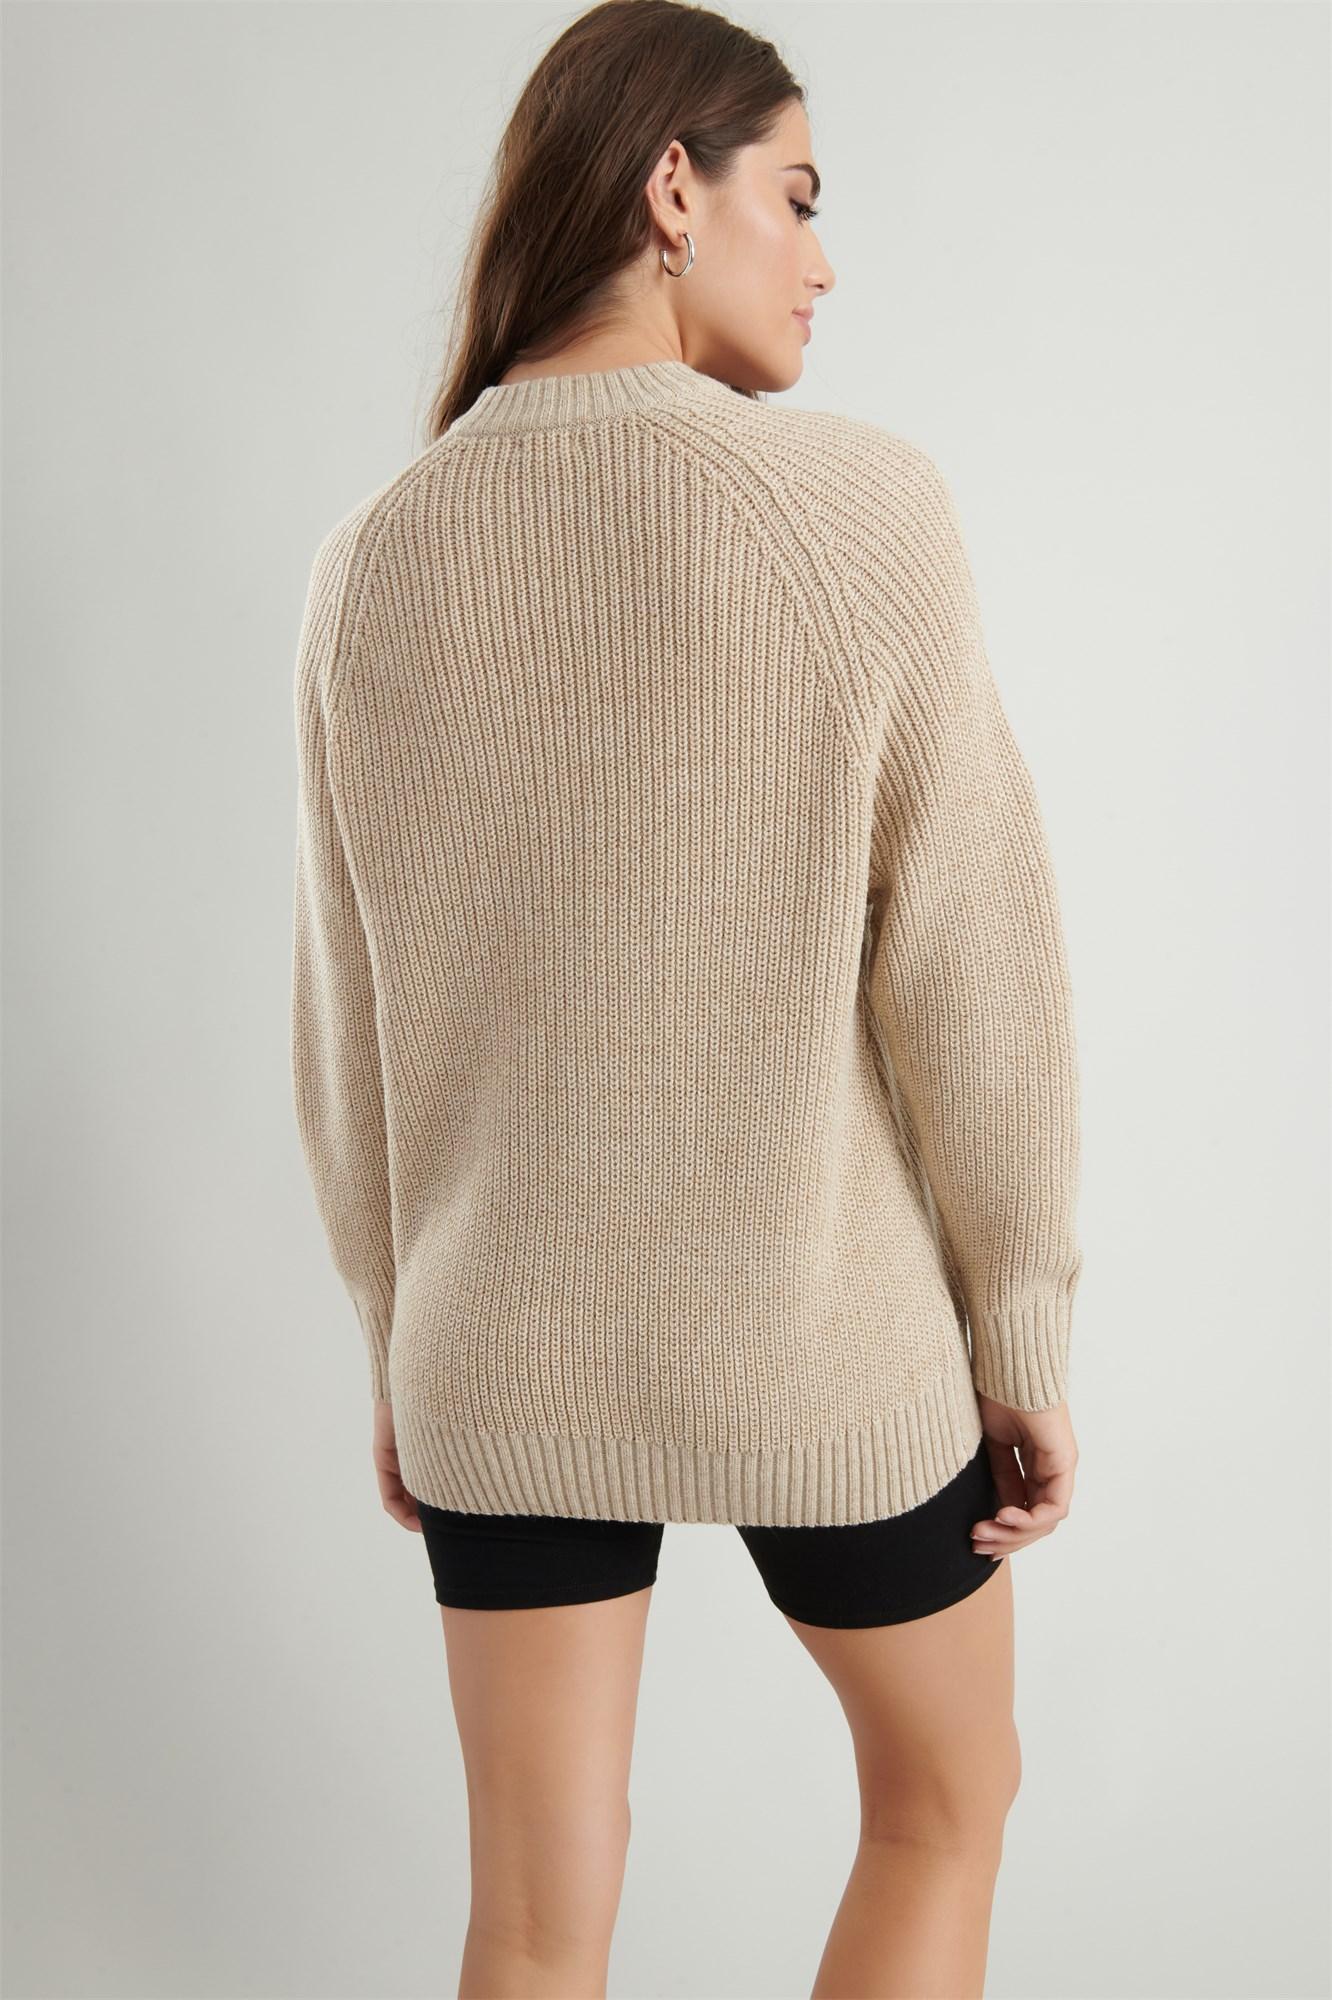 Image 5 of Crew Neck Tunic Sweater